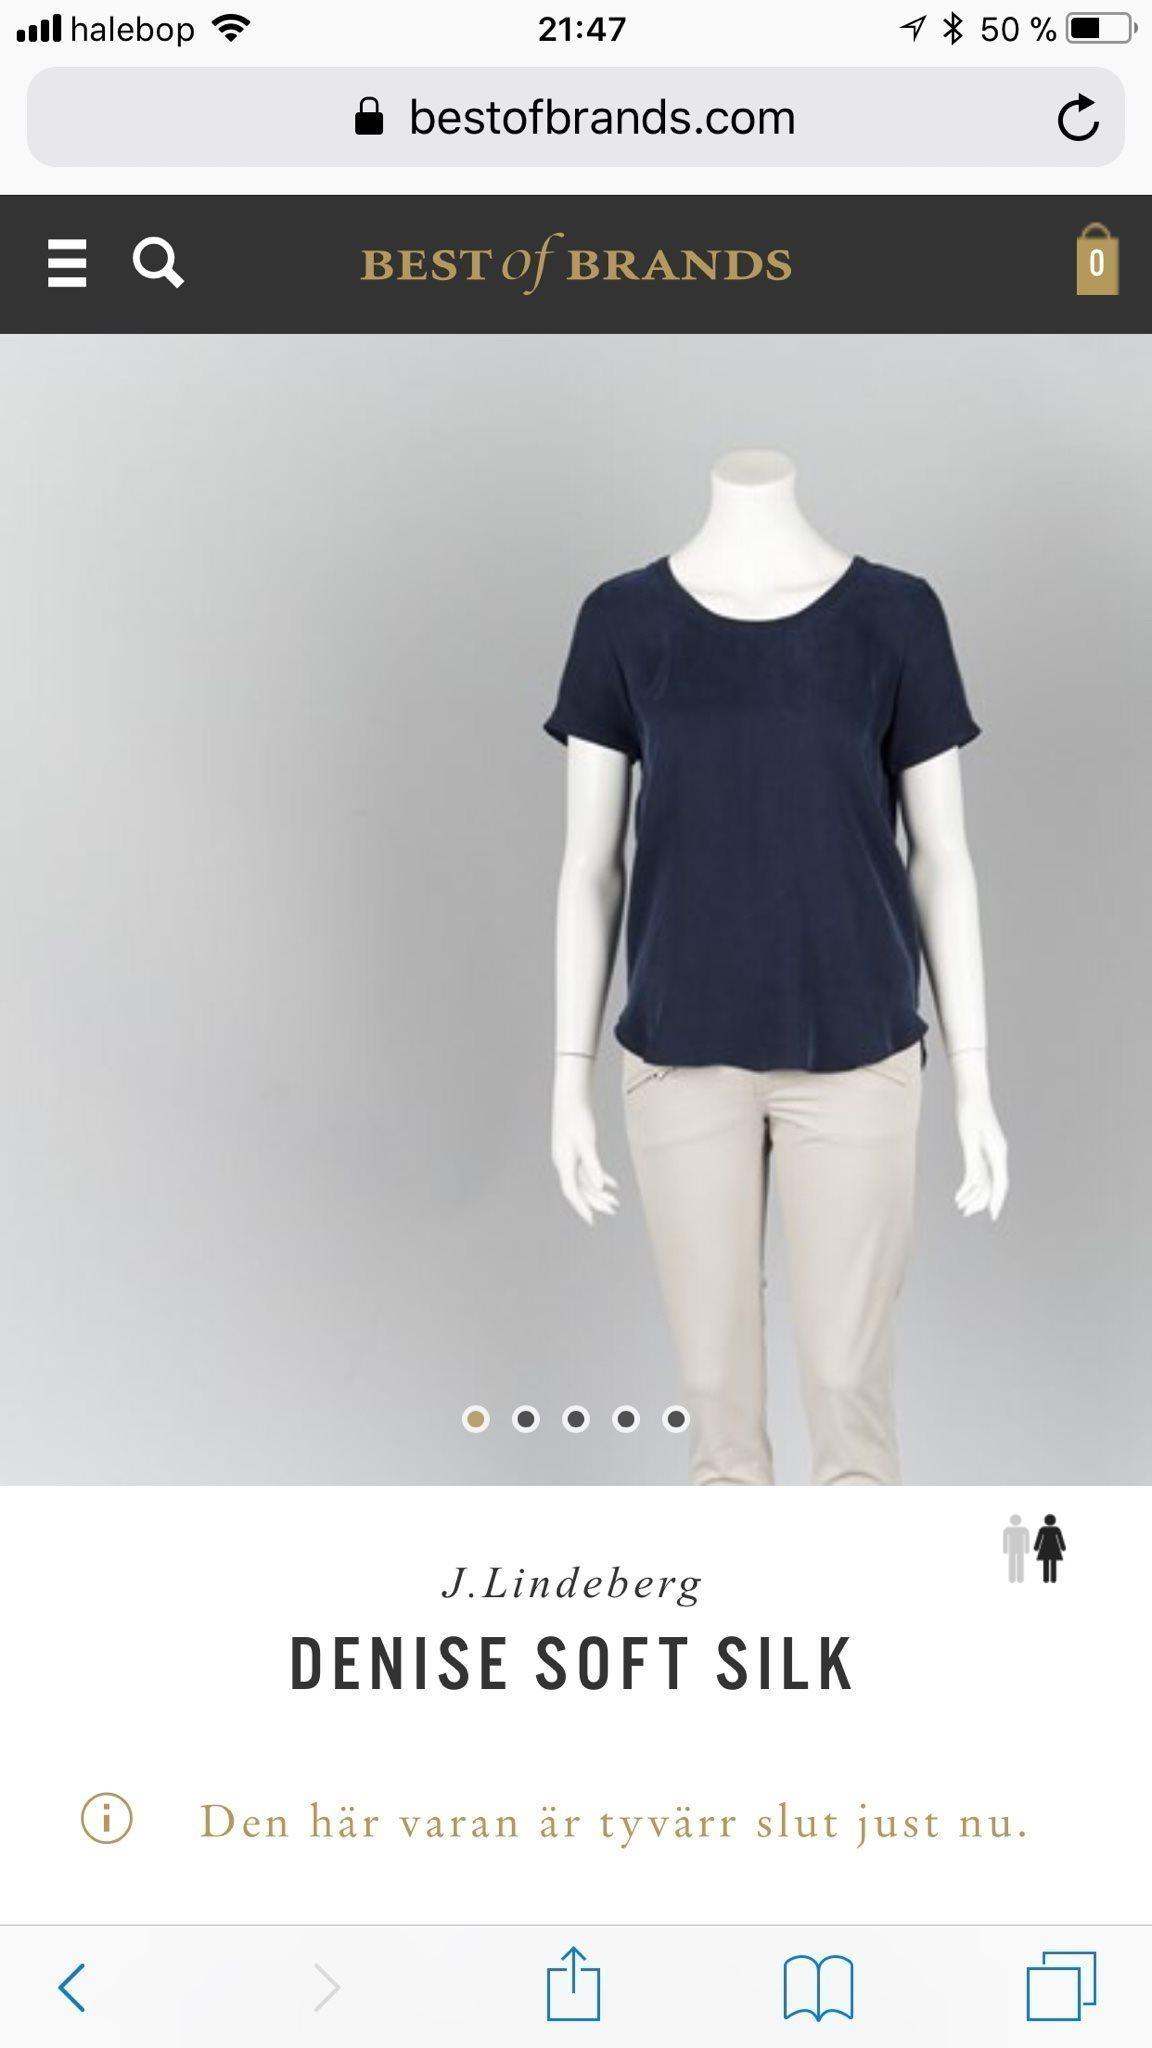 J.Lindeberg VIT topp stl 34 Denise soft Silk